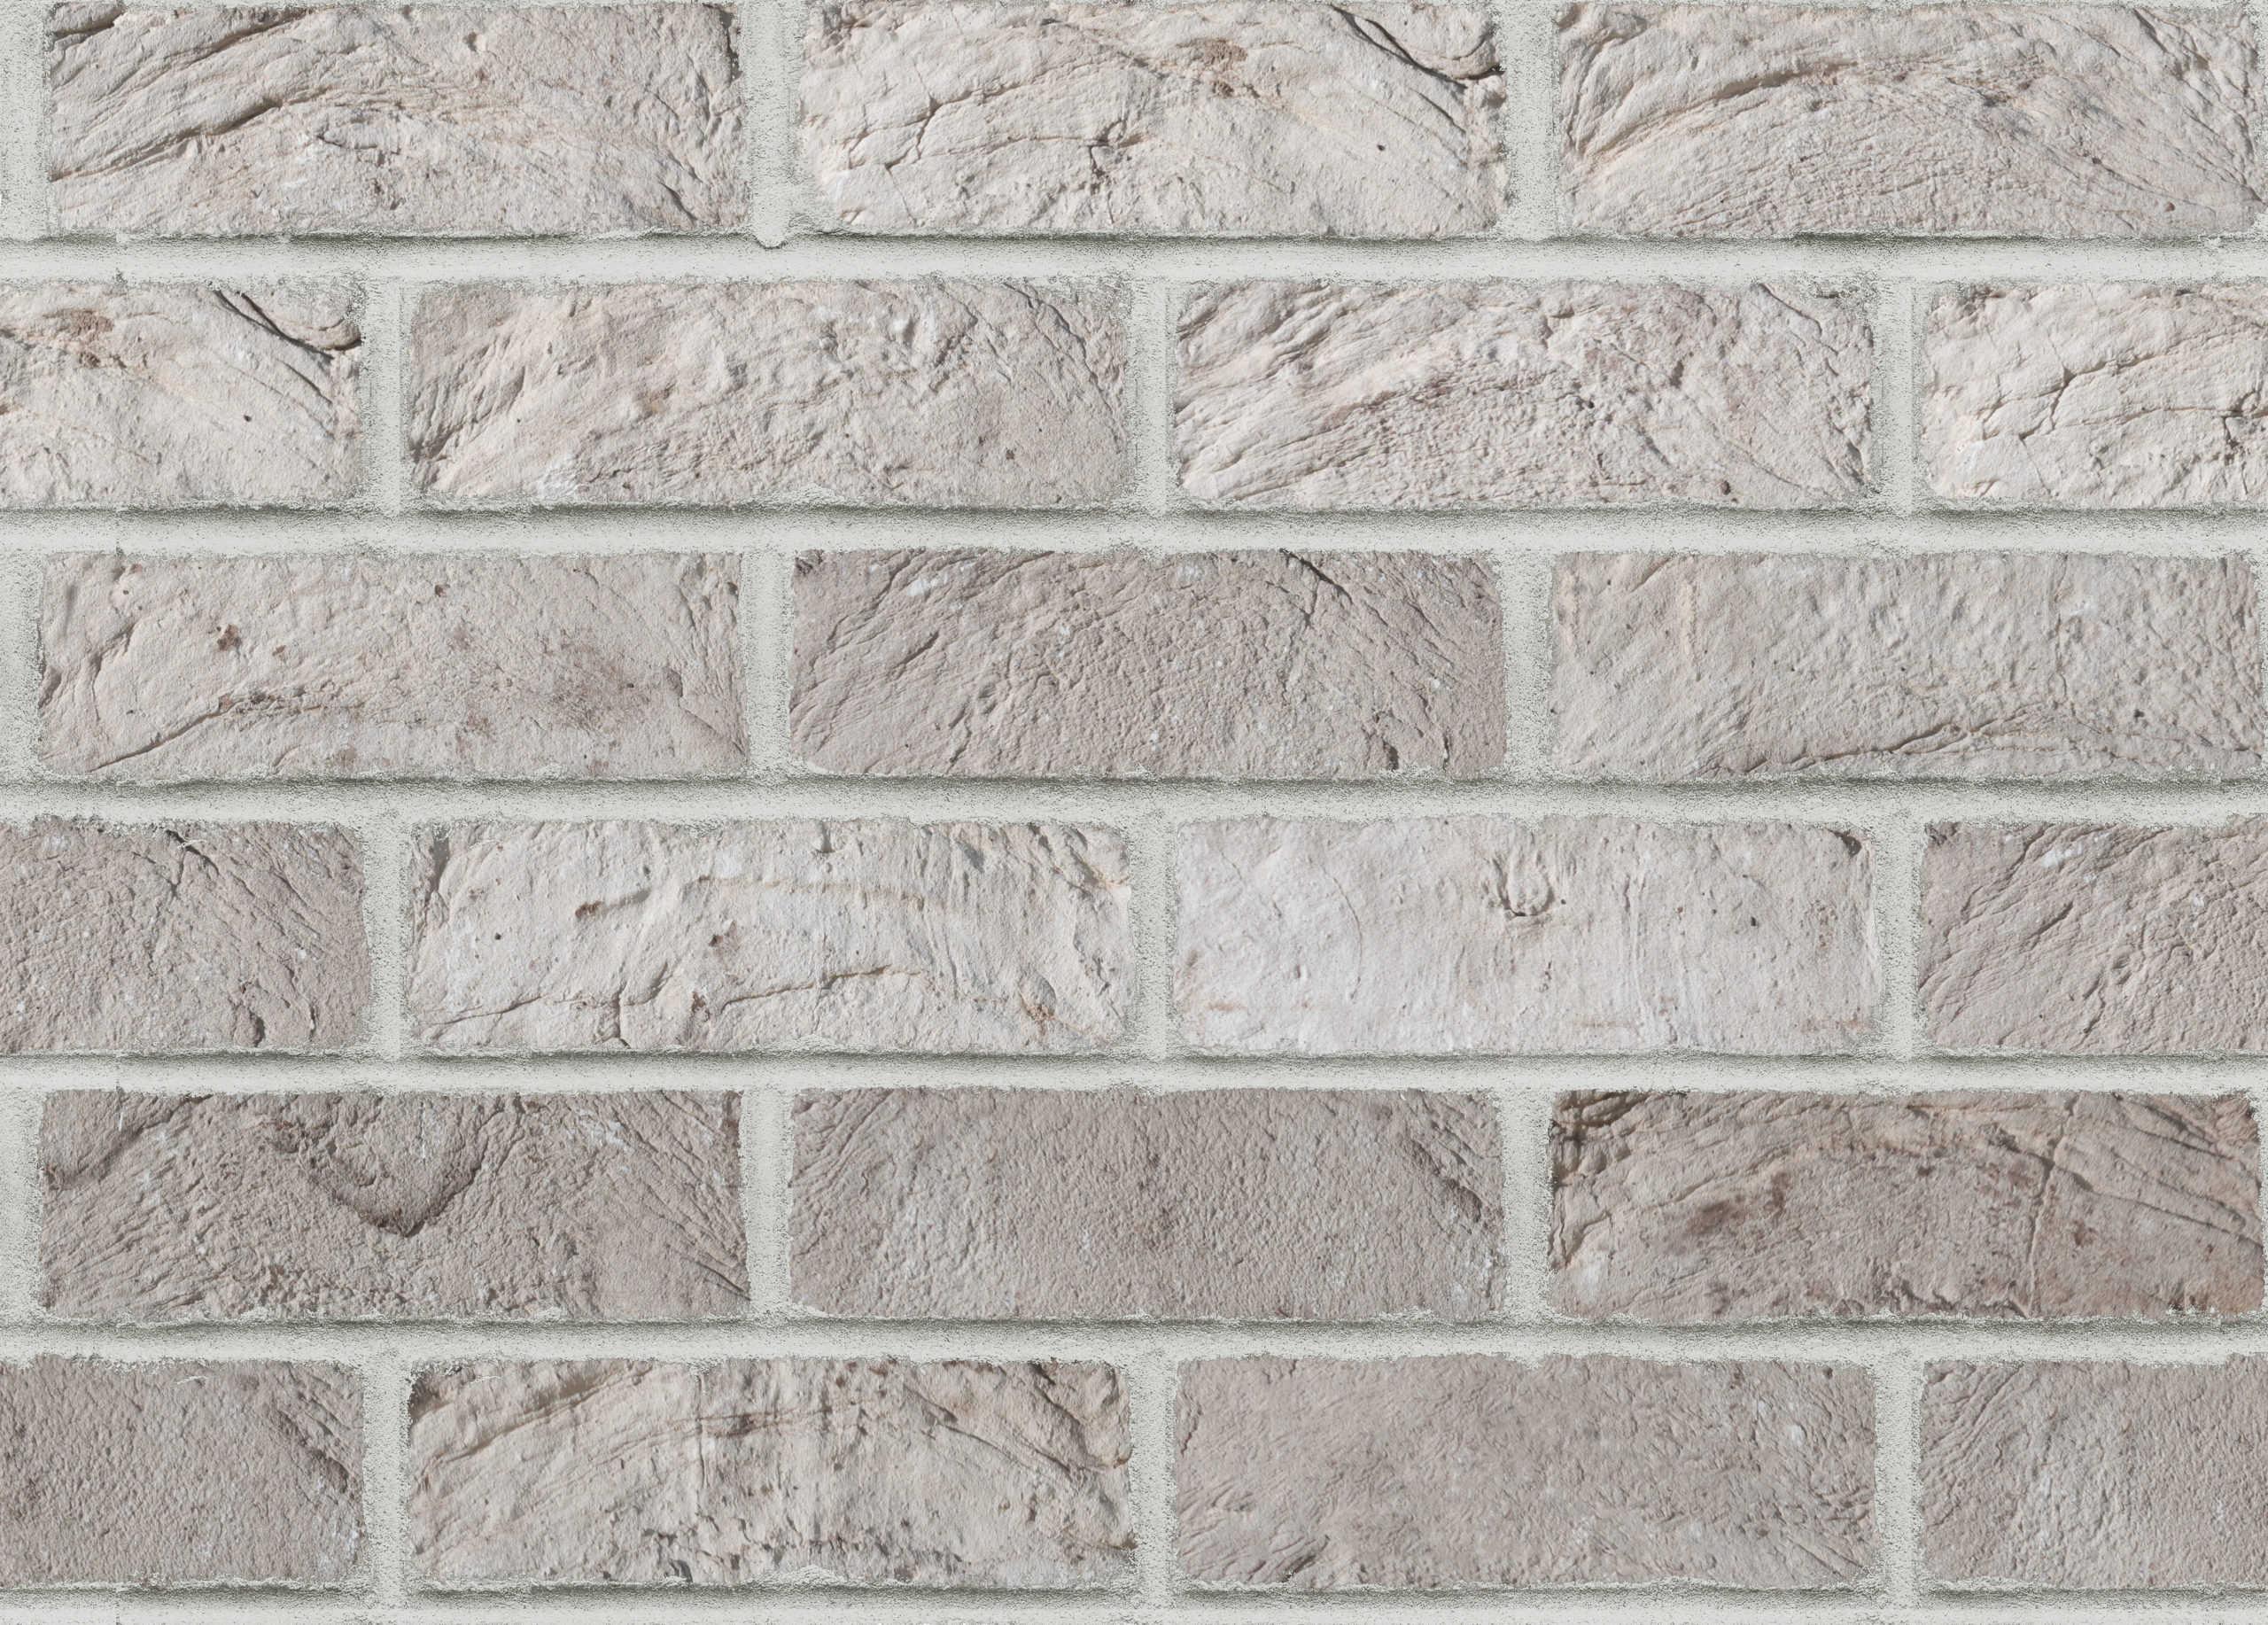 AB-Bricks-SanSelmoCloudySilver230x76-110-240-HiRes-NAT